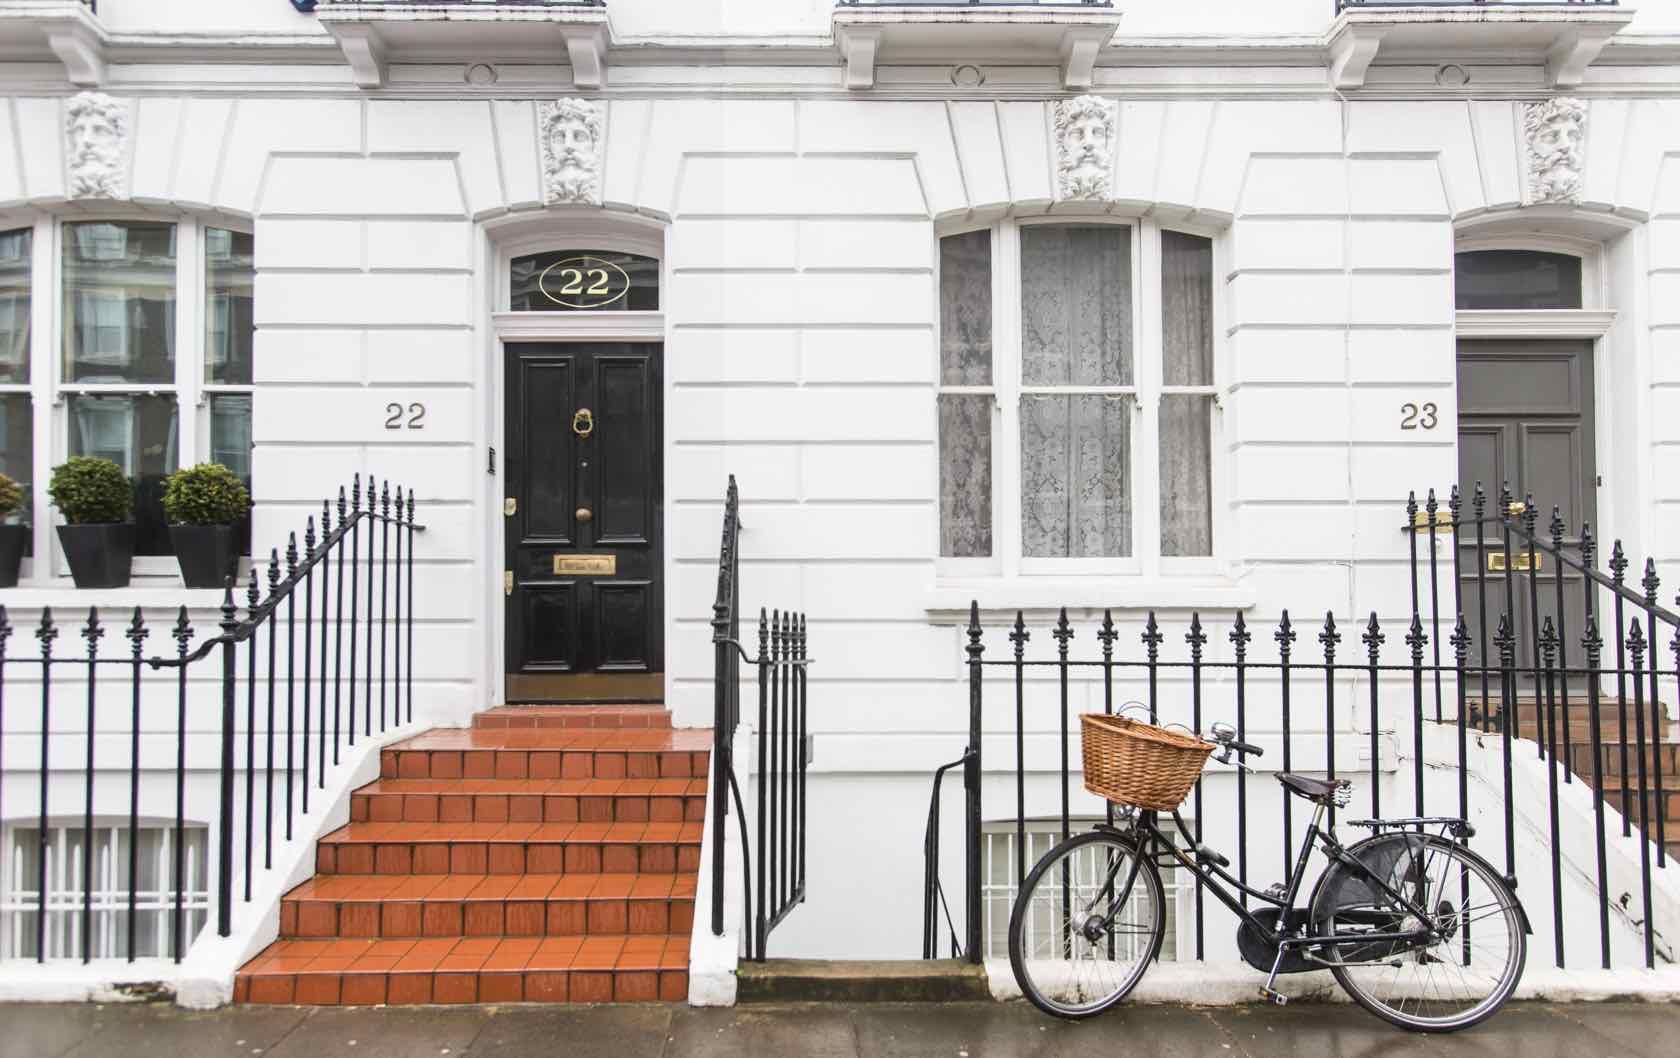 The Kensington Guide For Kings: Live Like Royalty In London's Most Regal Neighborhood